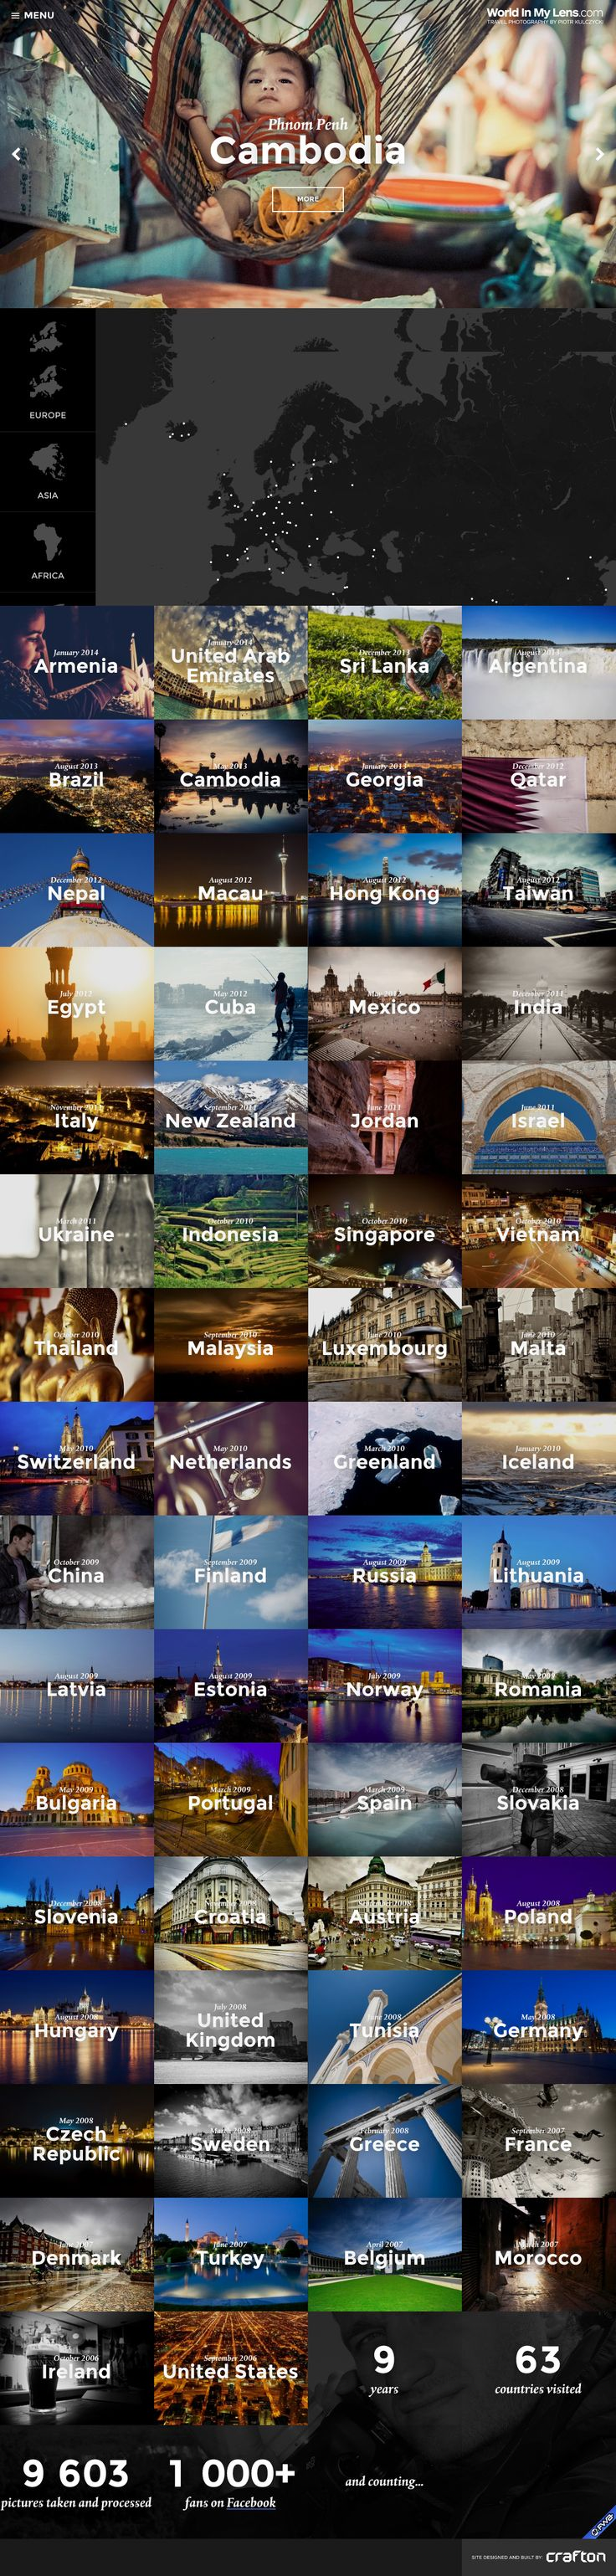 World In My Lens - portfolio gallery - #hamburger #verticalnav #picgallery #hover-slide-background #stats #counter // #hdpic